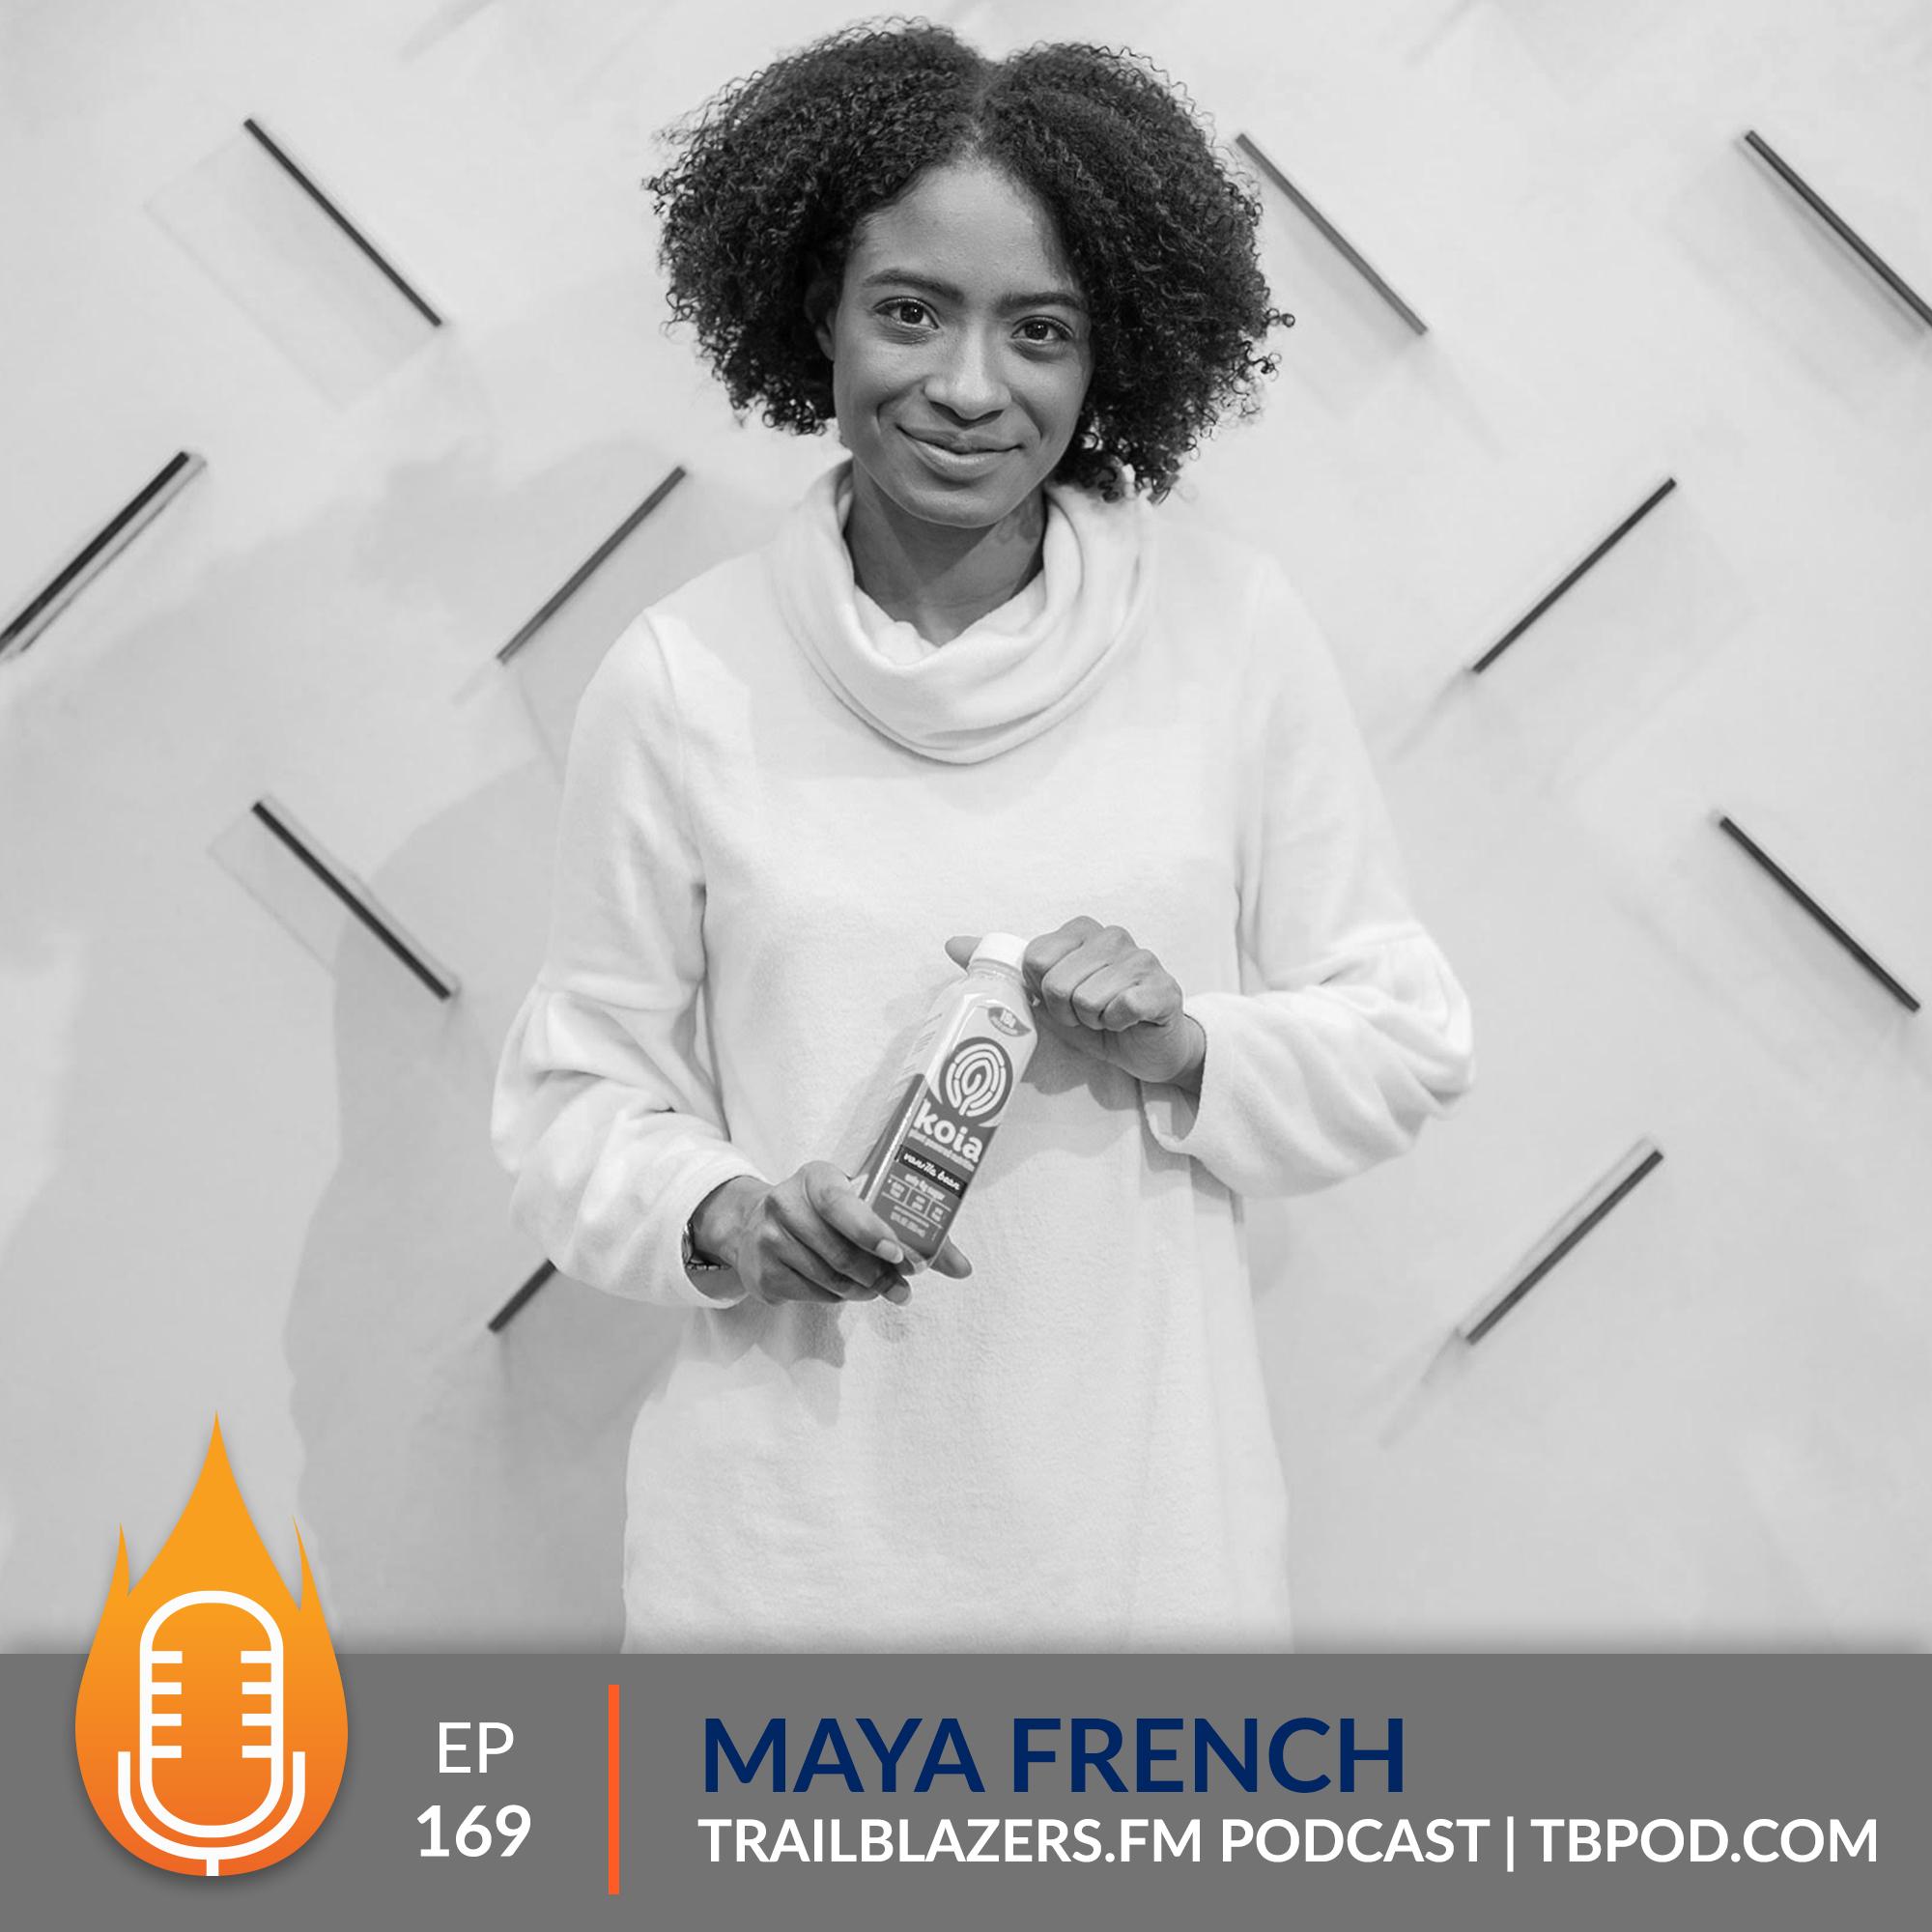 Maya French: Koia